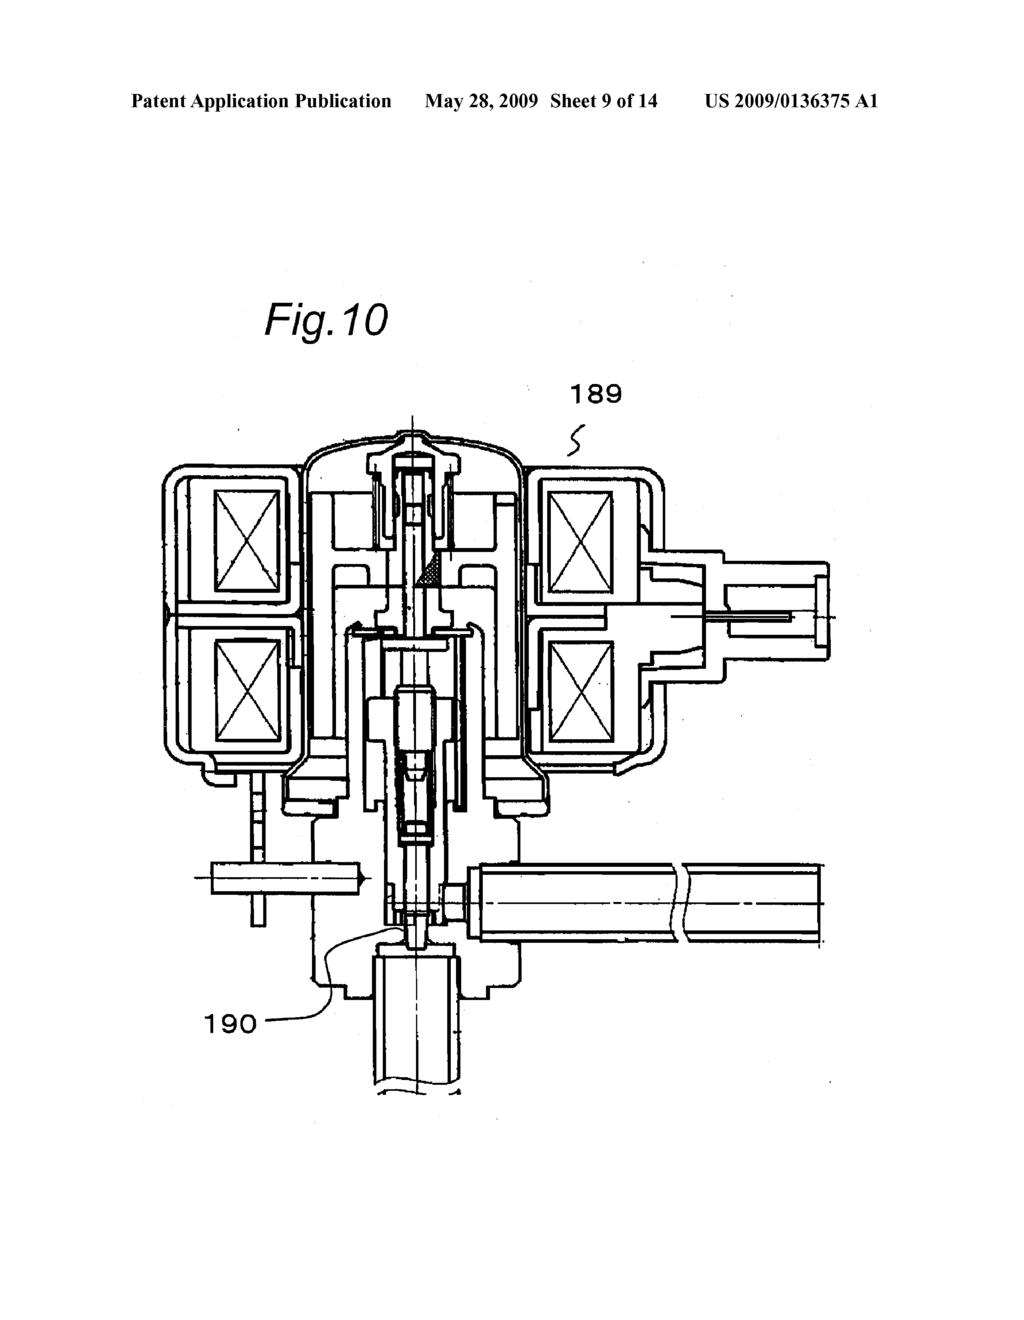 Refrigerant Compressor Cooling System And Refrigerator Diagram Schematic Image 10